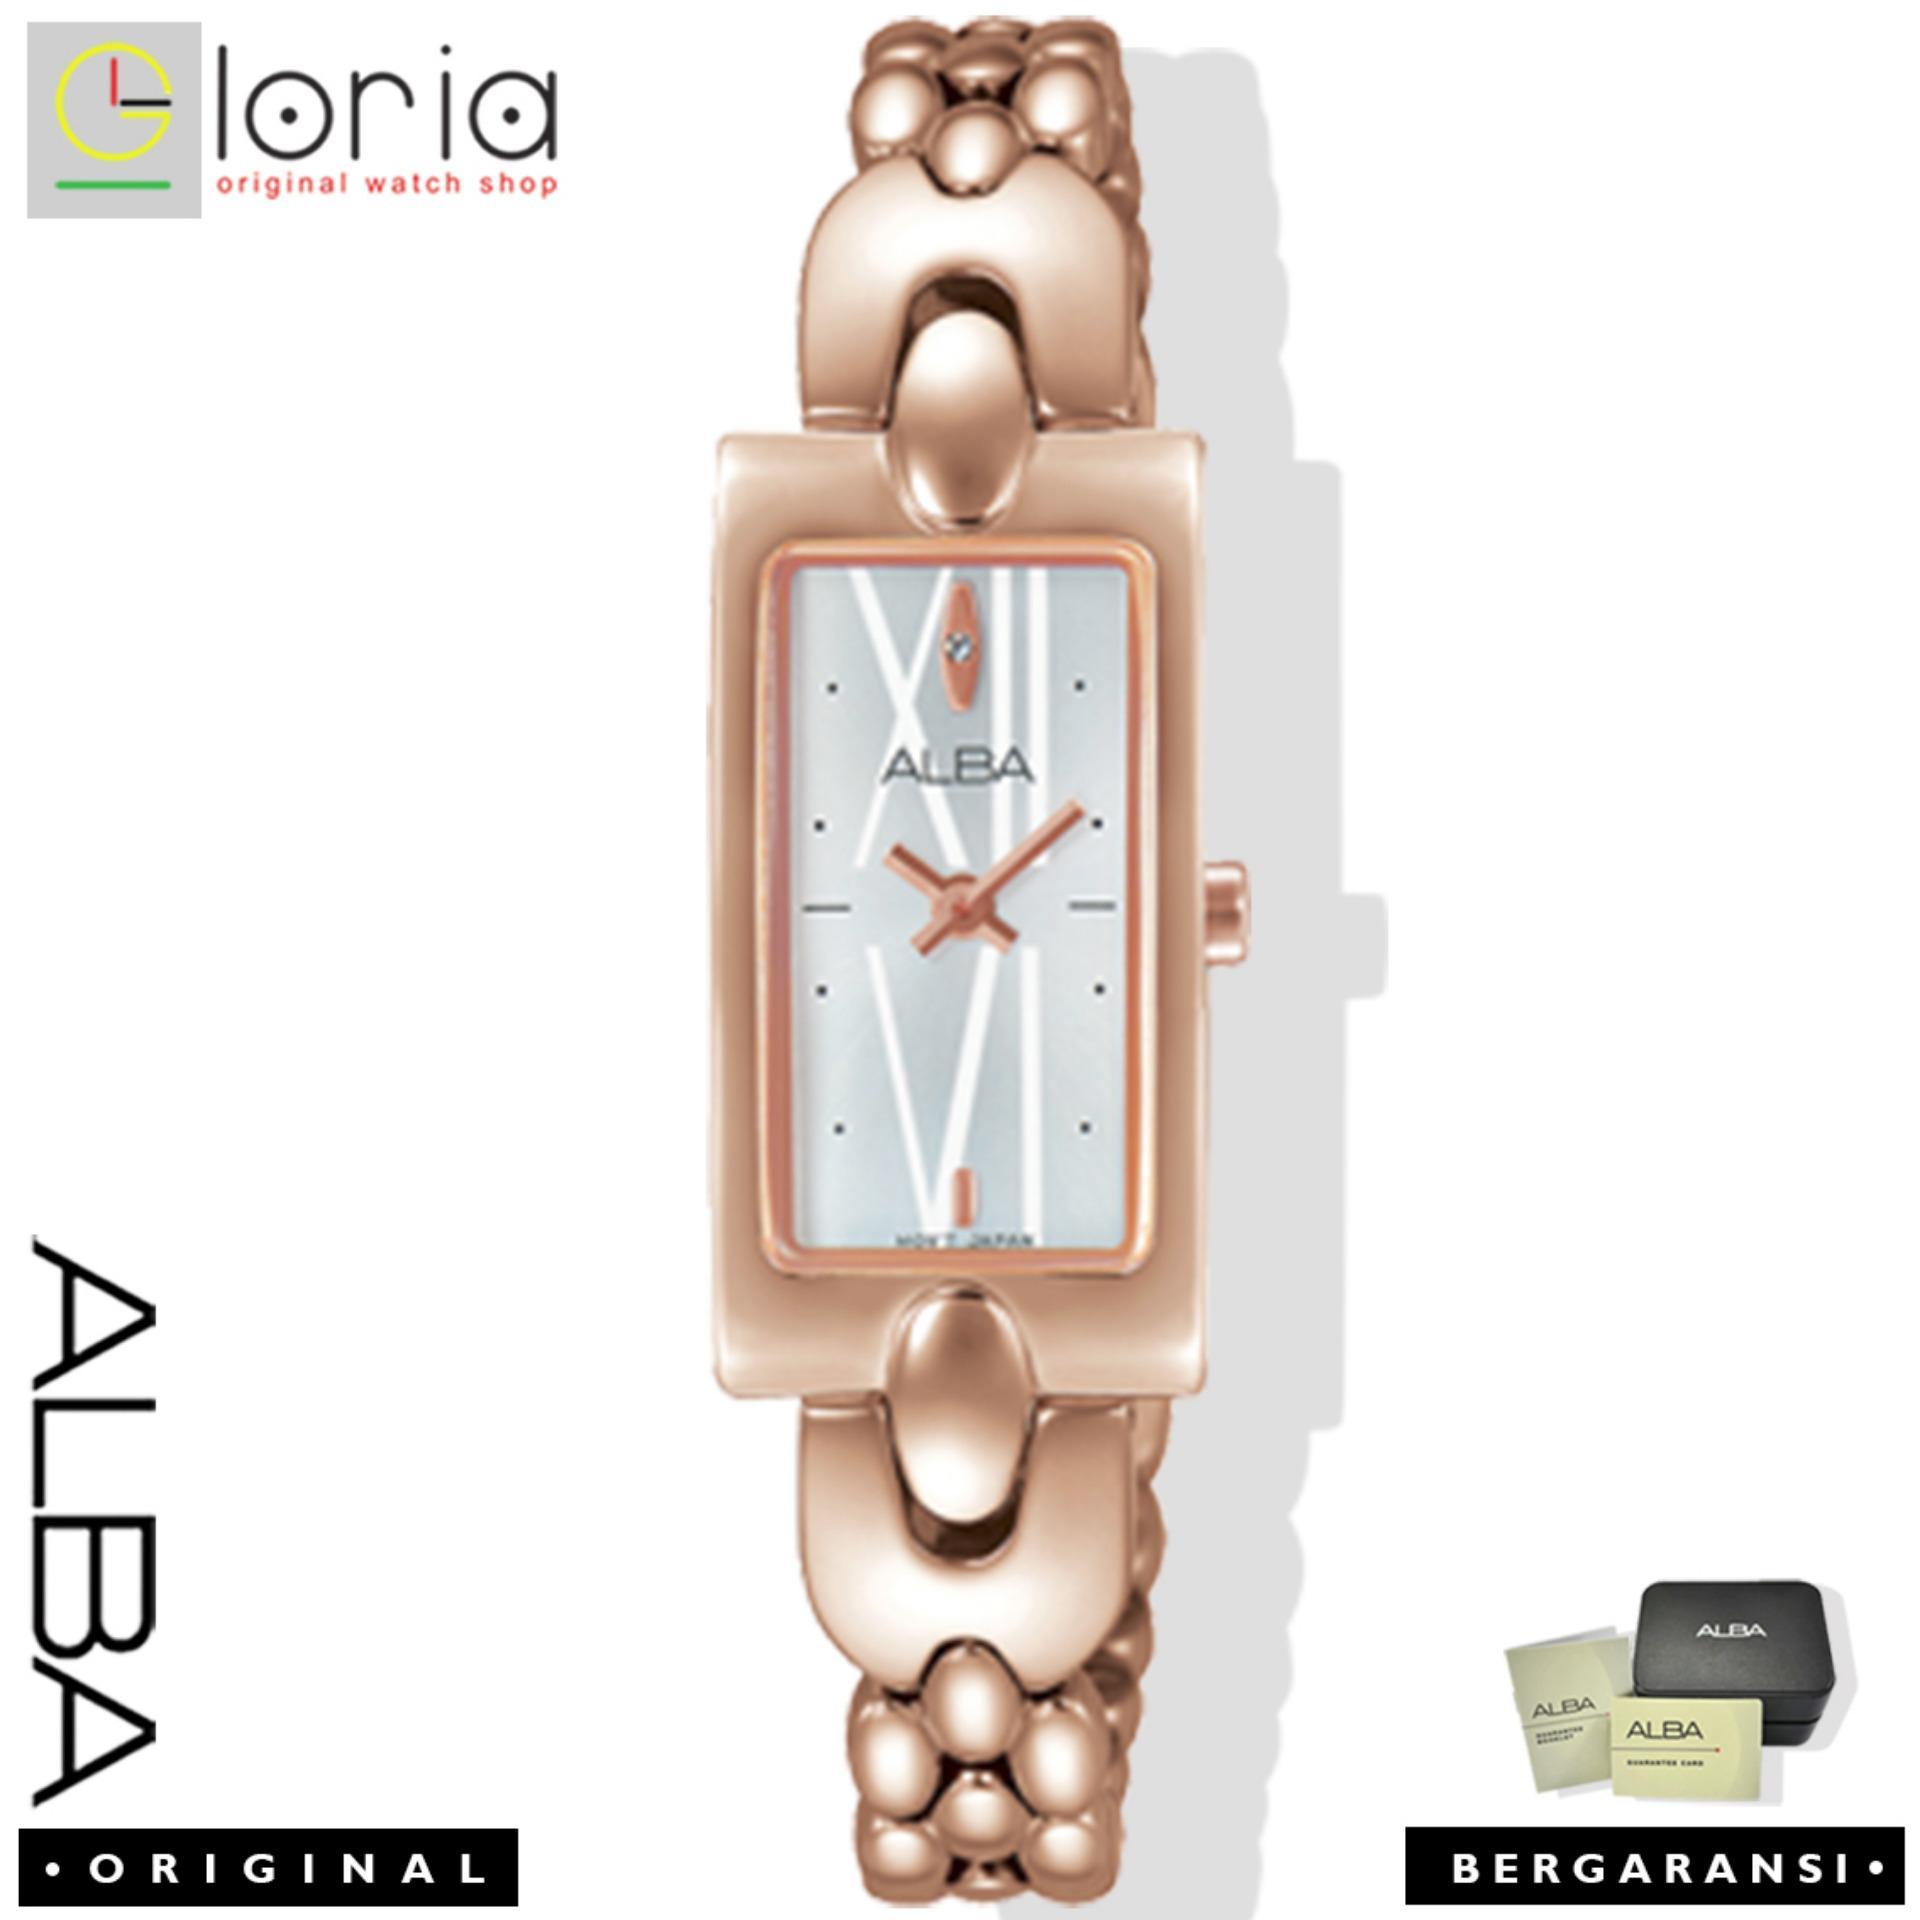 Alba Fashion Jam Tangan Wanita - Tali Stainless Steel - Gold - AEGD36X1 dc86a1cc48